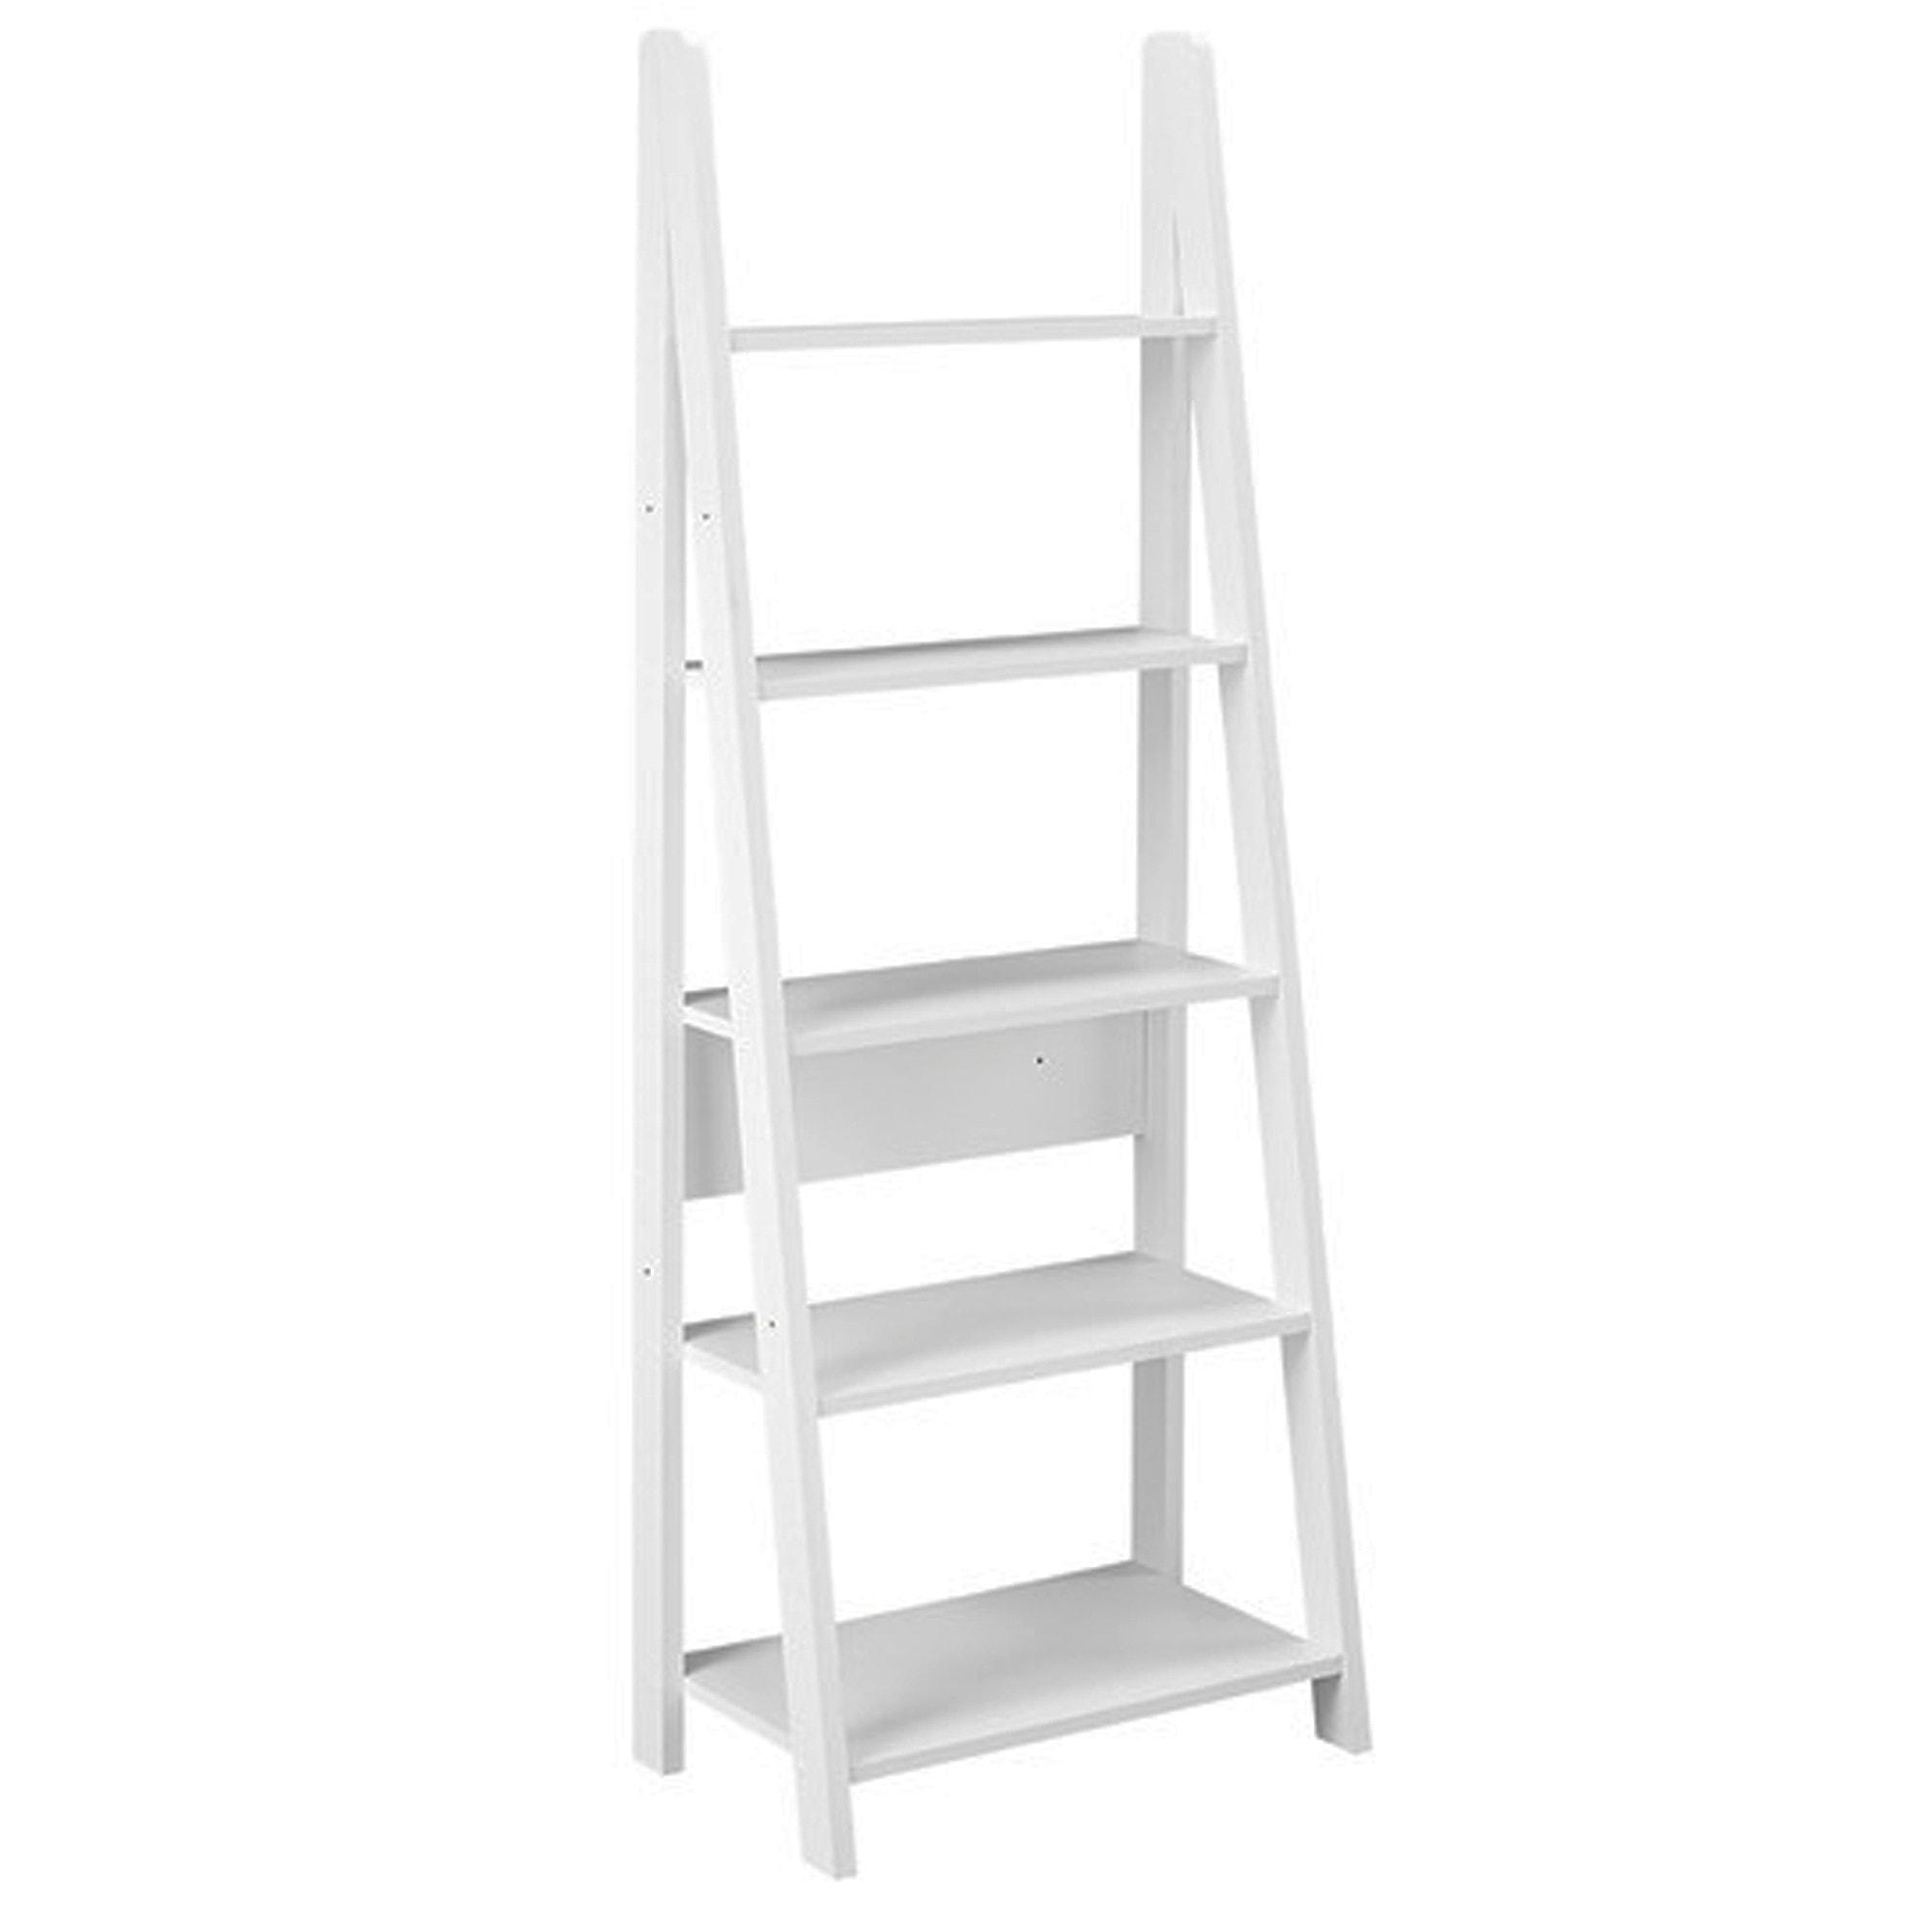 Tiva Ladder White Bookcase